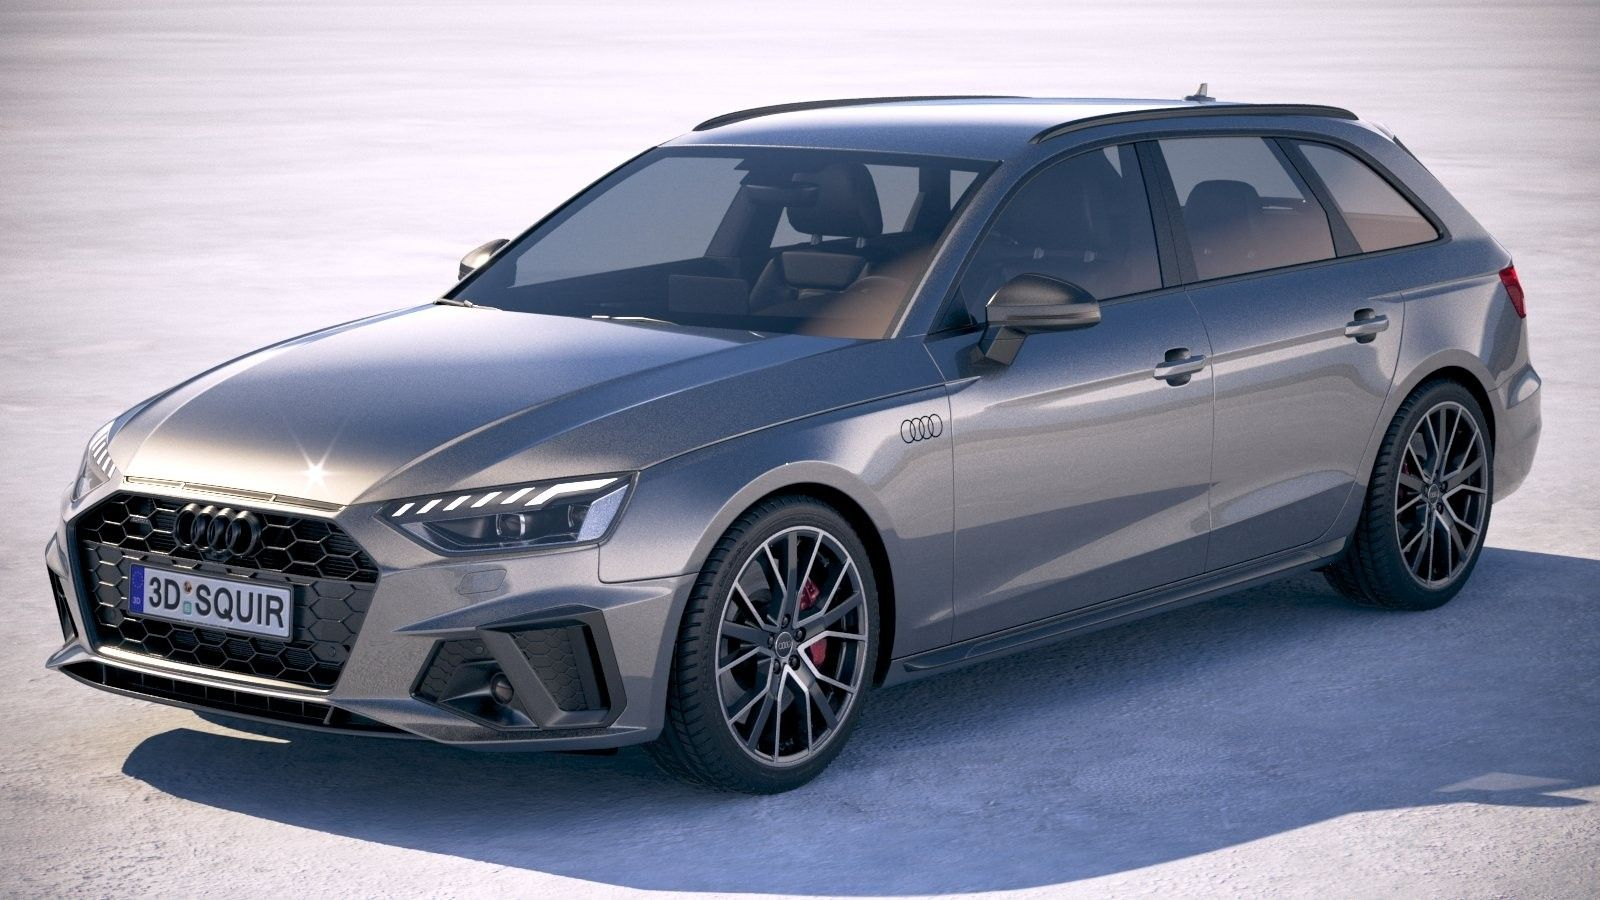 Audi A4 Avant S Line 2020 Audi S4 Audi A4 Avant Audi A4